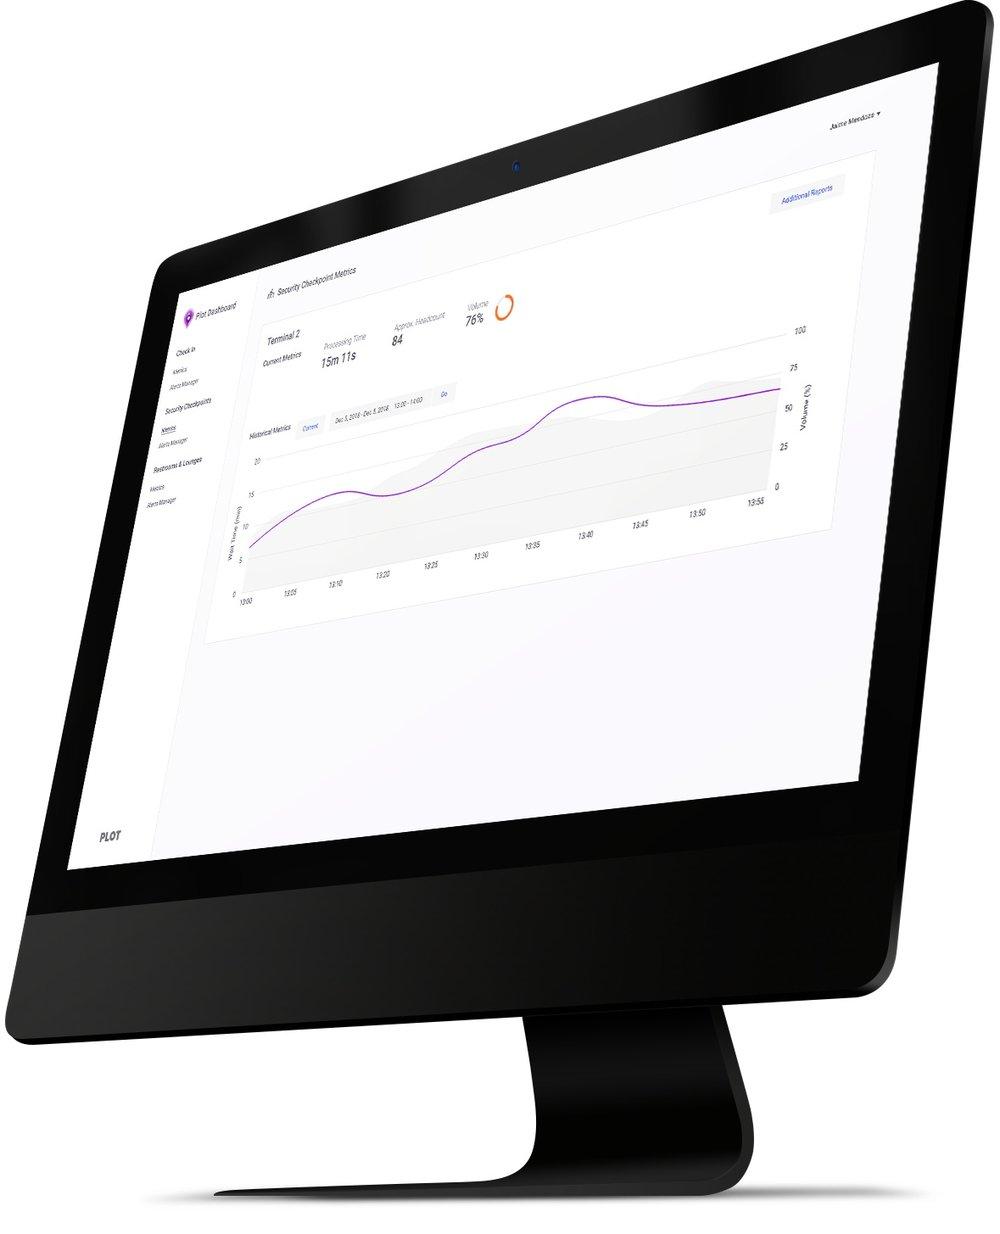 security-checkpoint-analytics-Mac.jpg